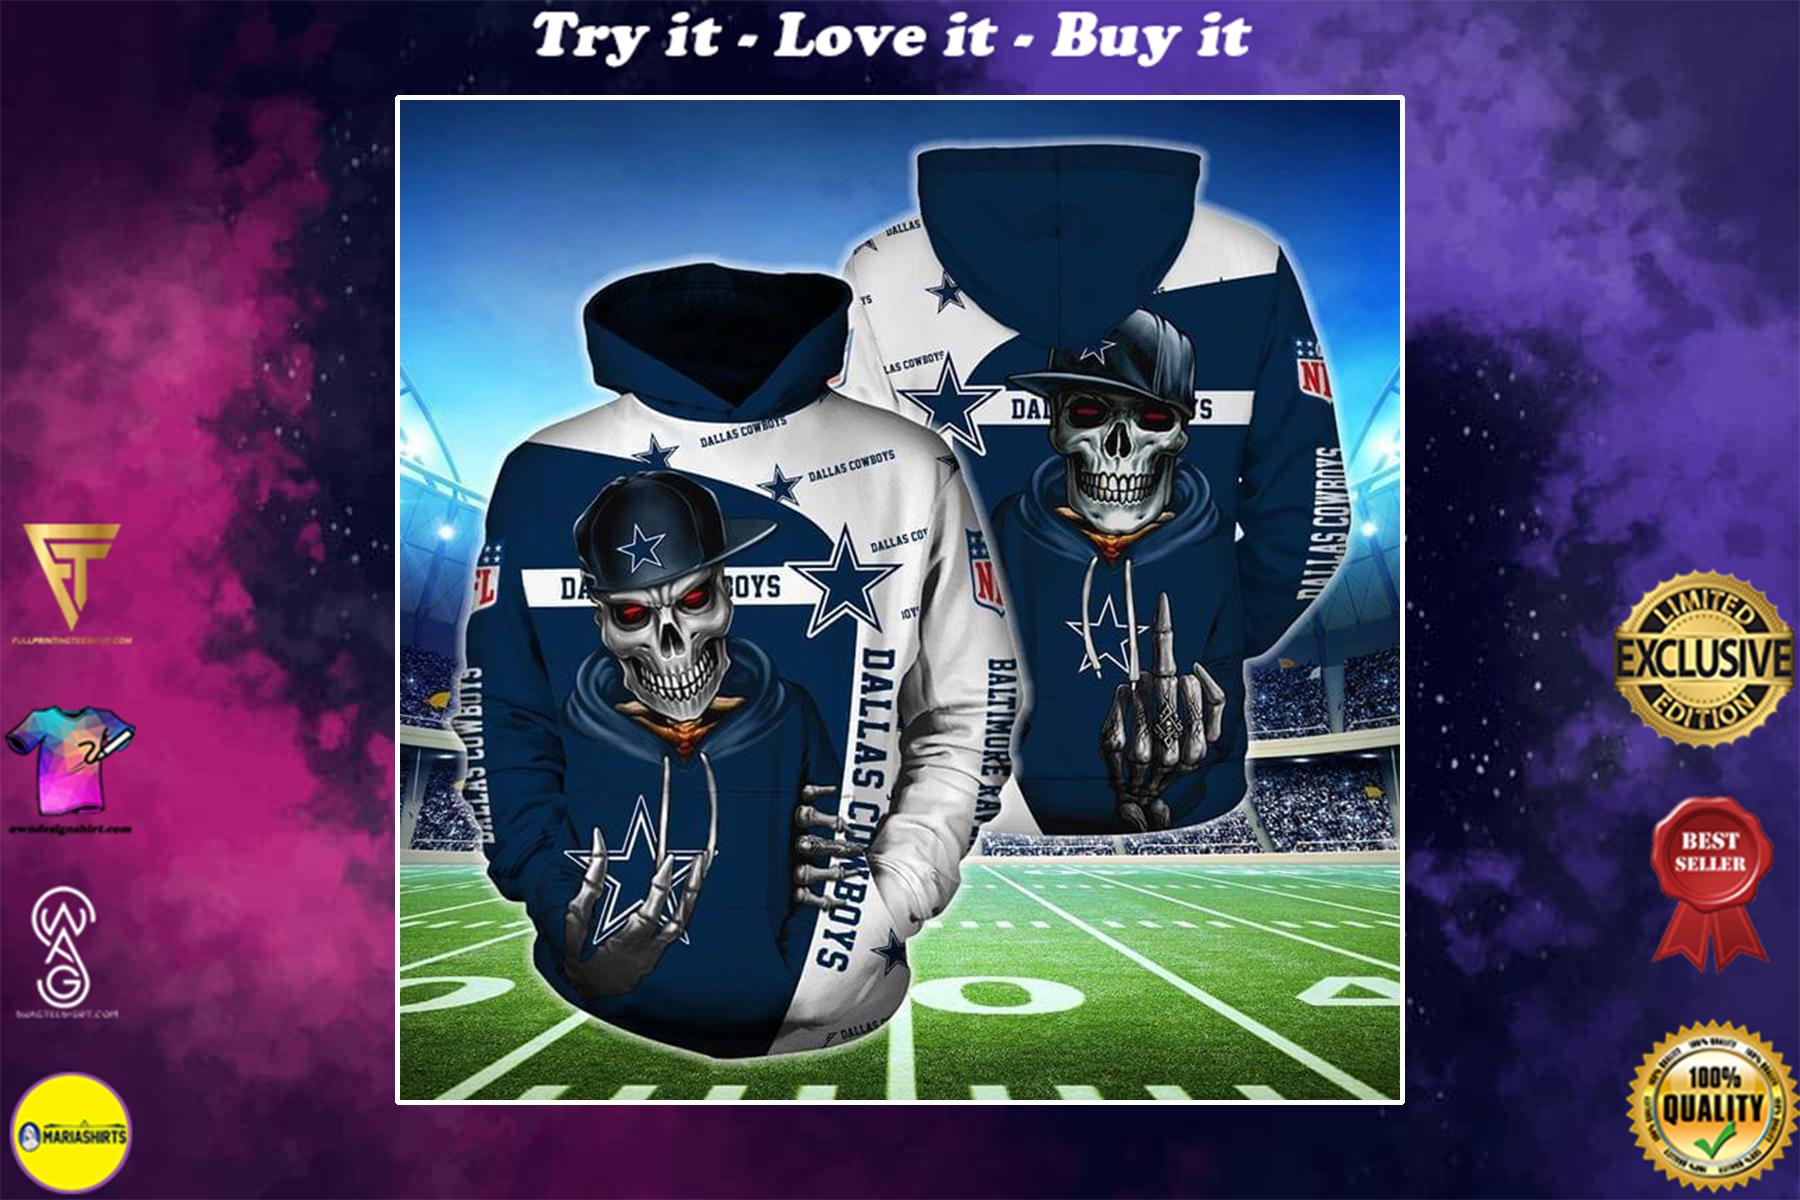 [special edition] hip hop skull dallas cowboys football team full over printed shirt - maria